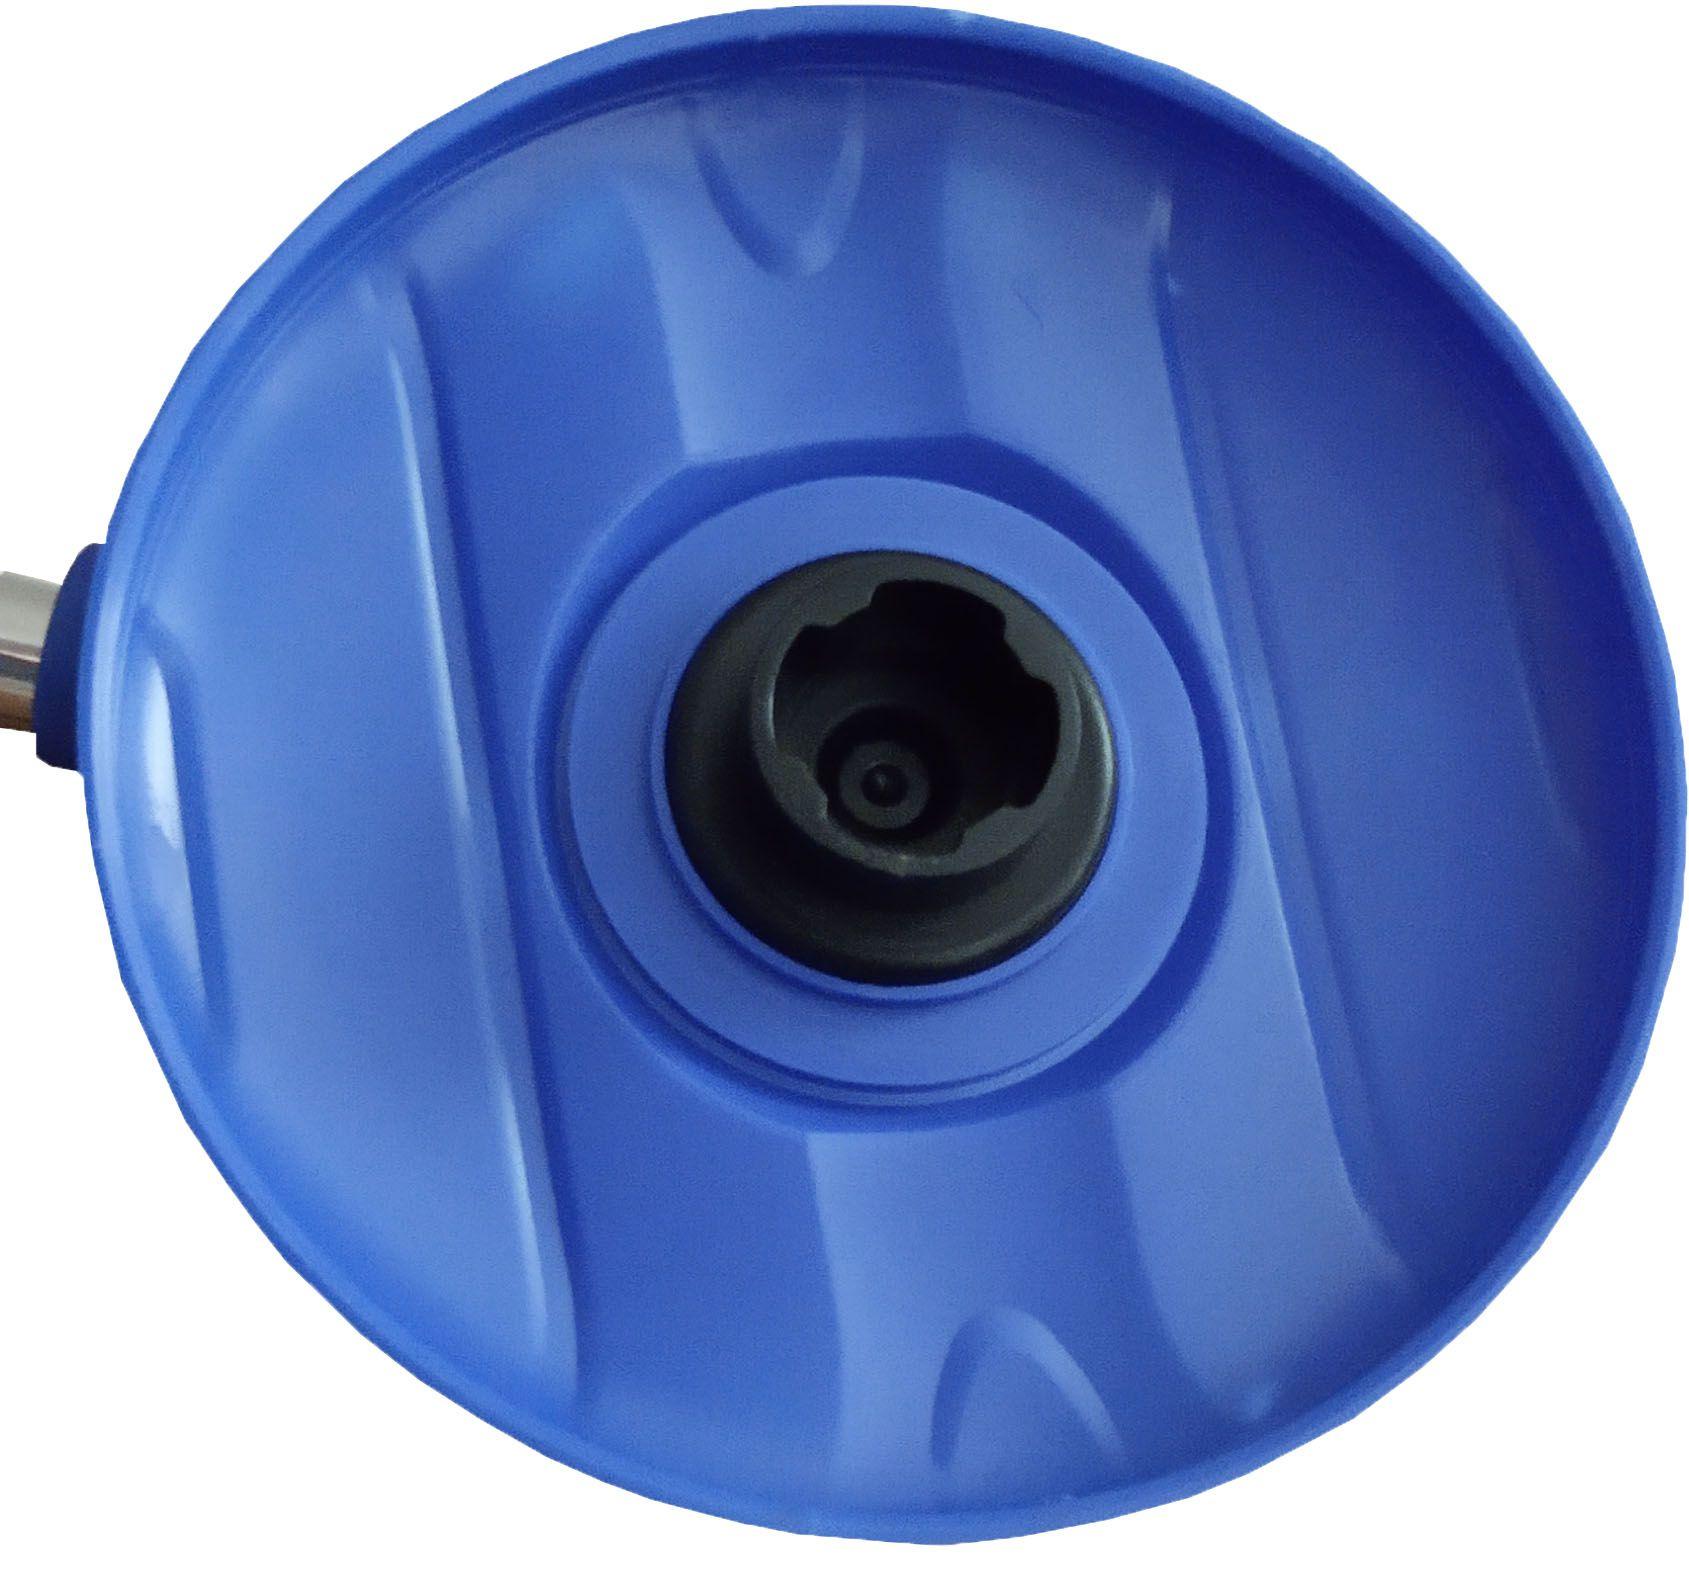 Perfect Mop 360 Cesto Inox  Com 4 Refis Microfibra e Cabo 1,60 Metros